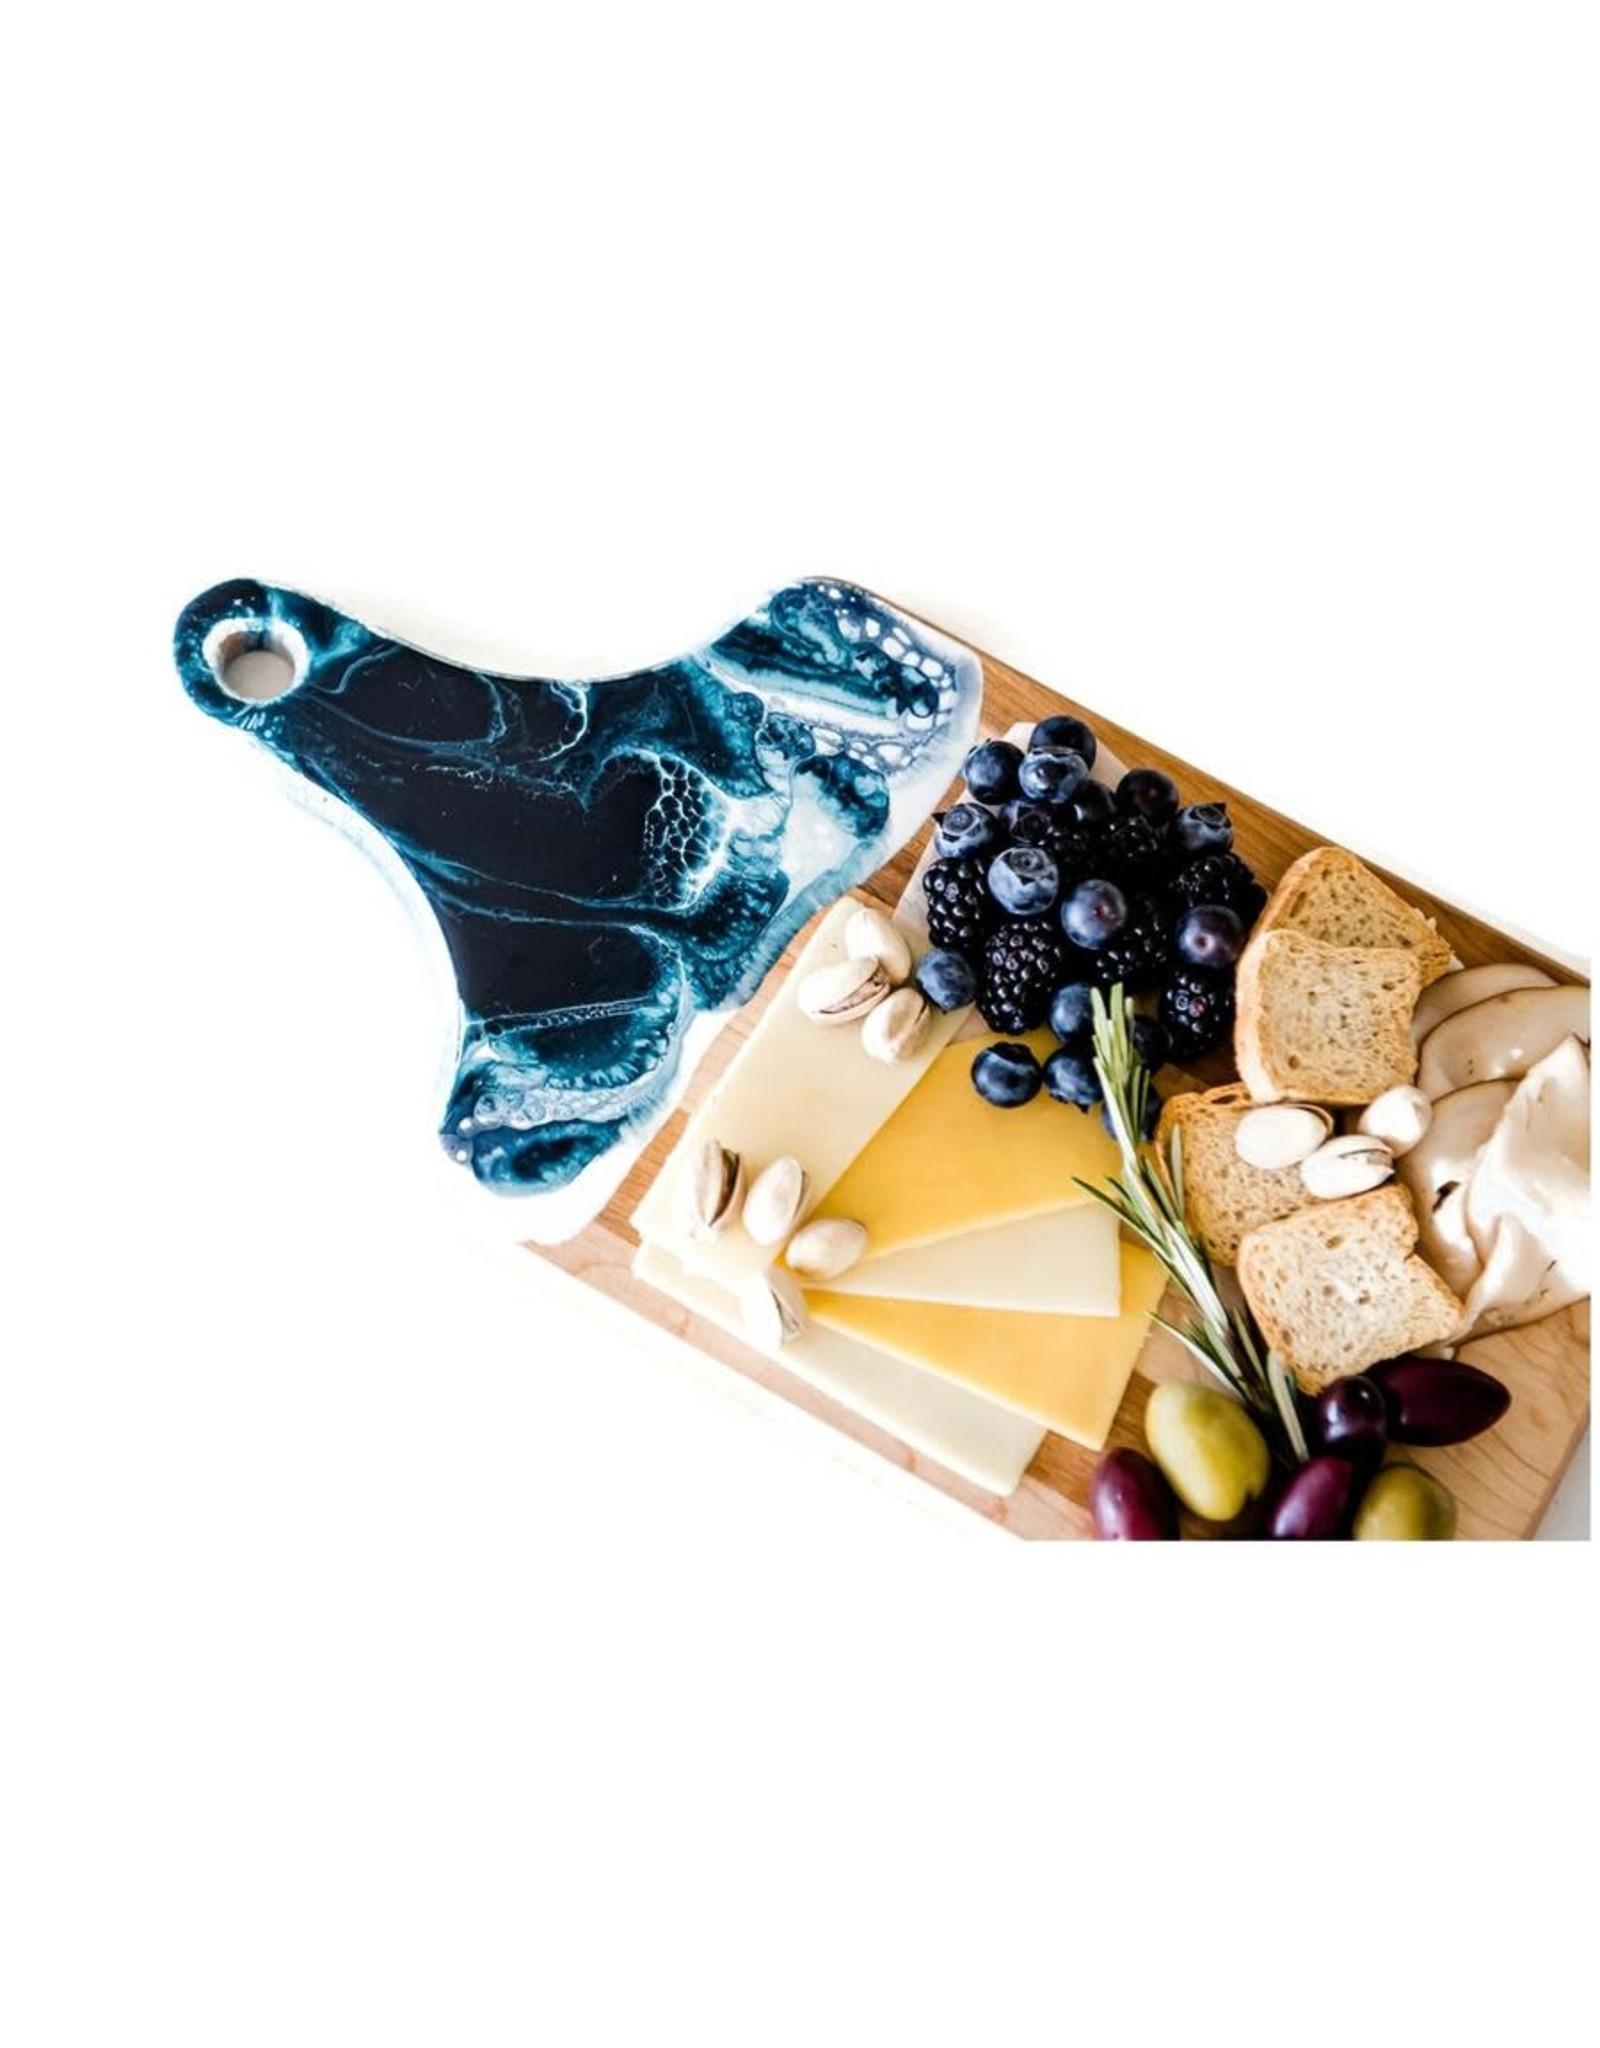 "Lynn & Liana Serveware Small Cheese Boards - 7"" x 14"""